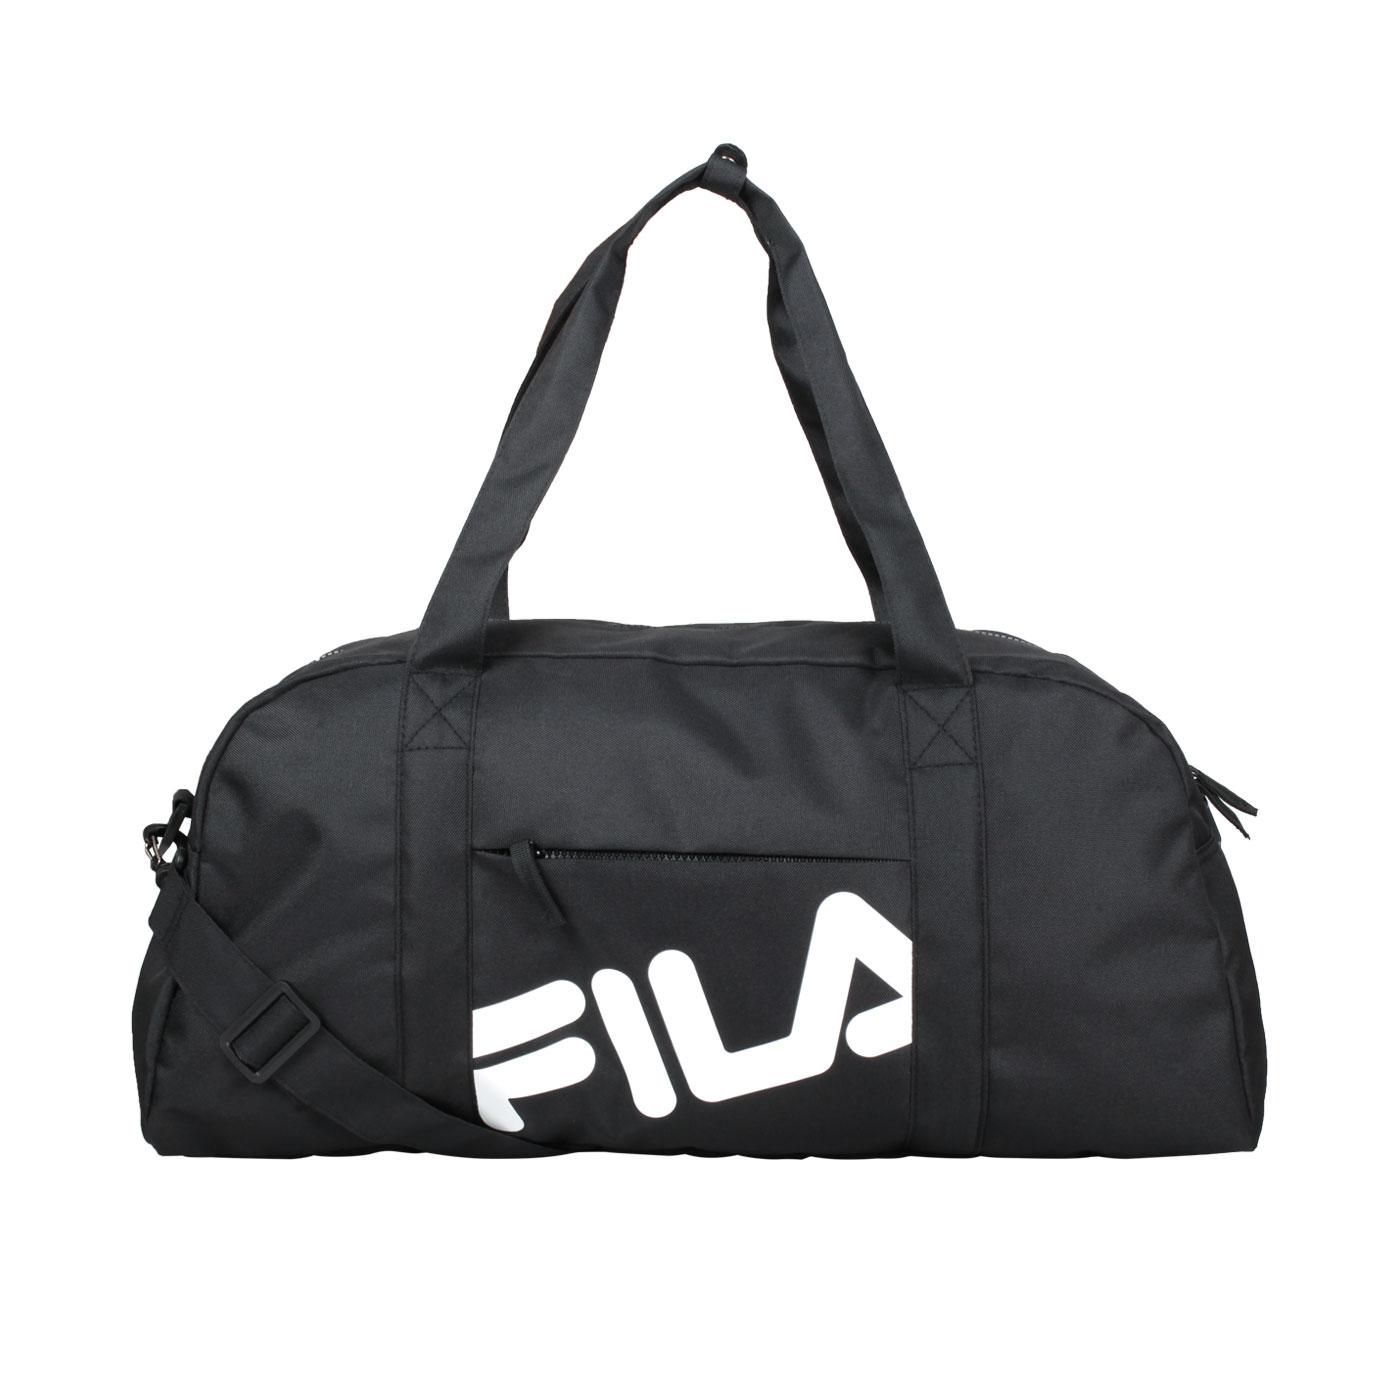 FILA 訓練運動提袋 OTV-3016-BK